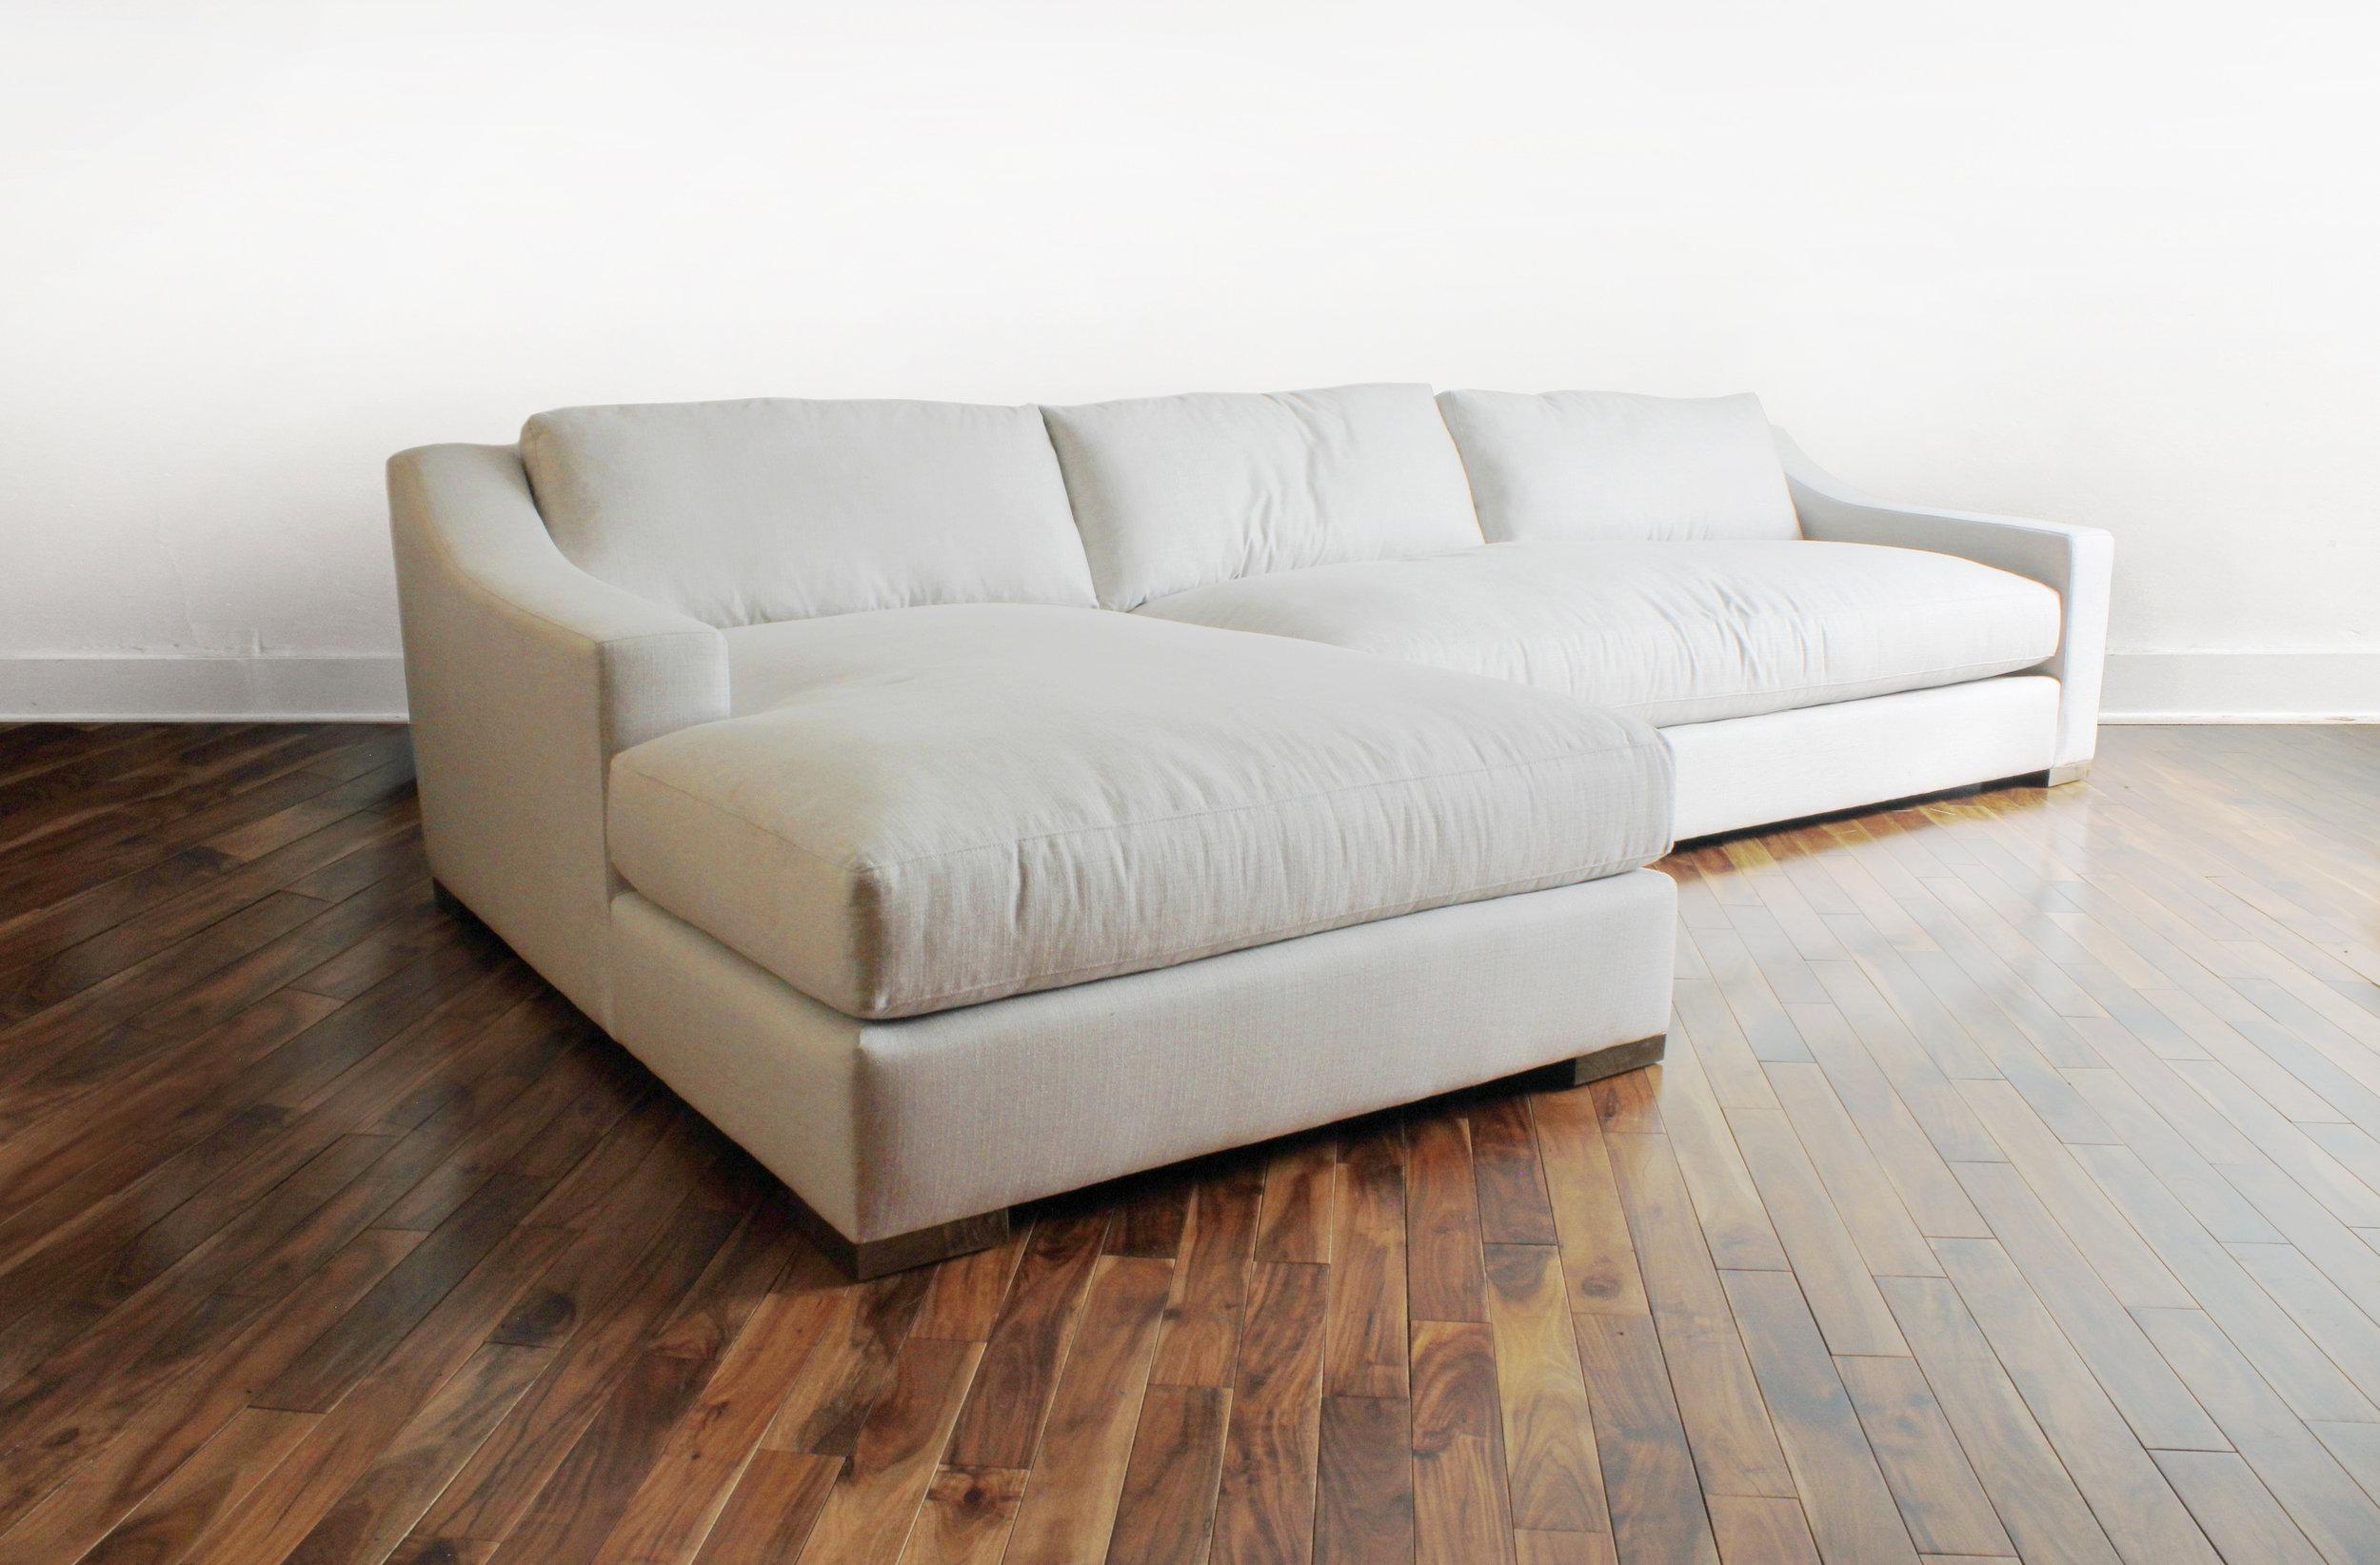 Aspen | Sofa-chaise